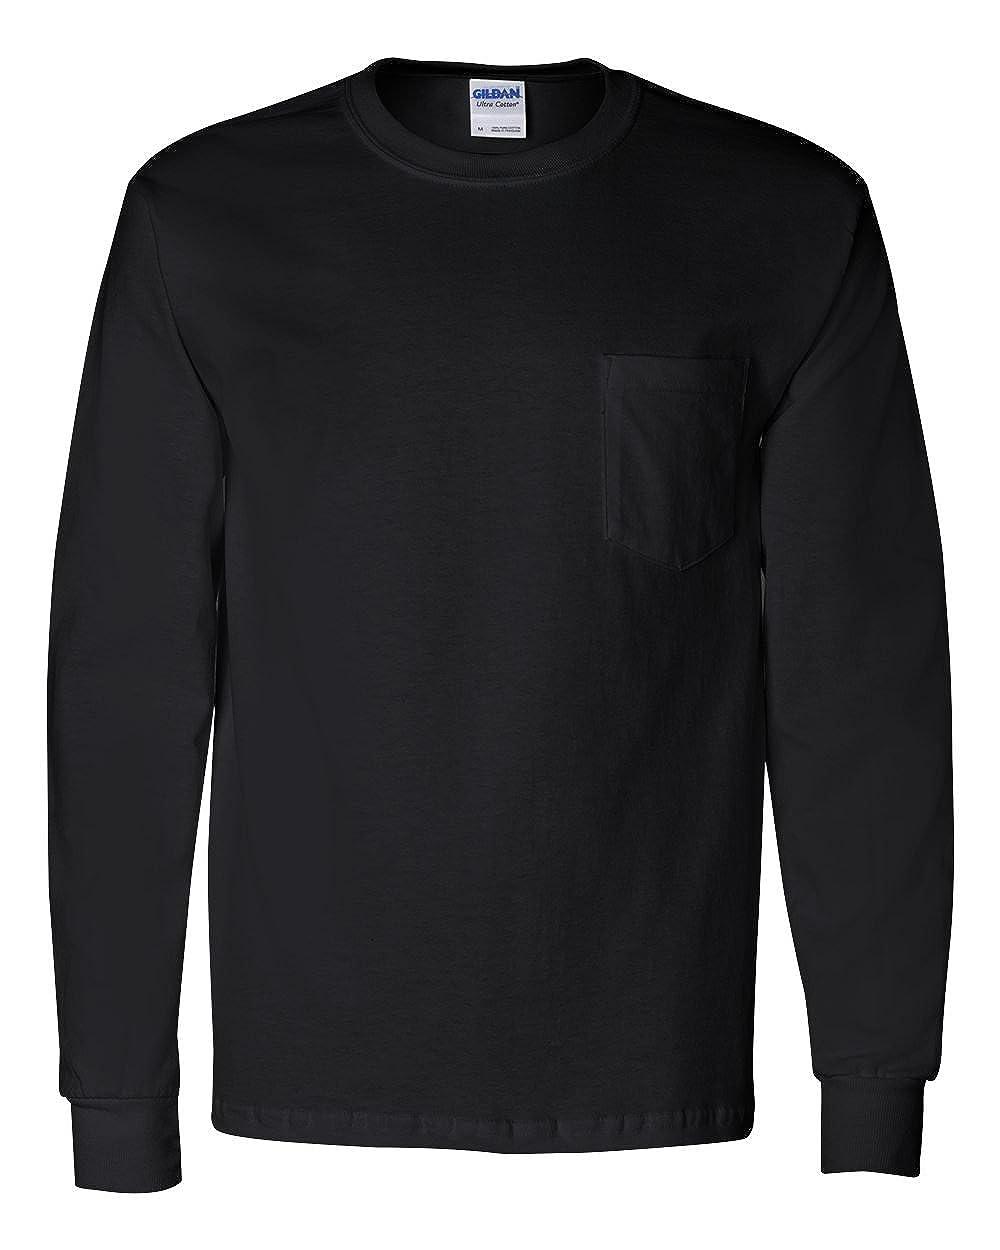 Gildan Adult Ultra CottonTM Long-Sleeve T-Shirt with Pocket 2410-Black